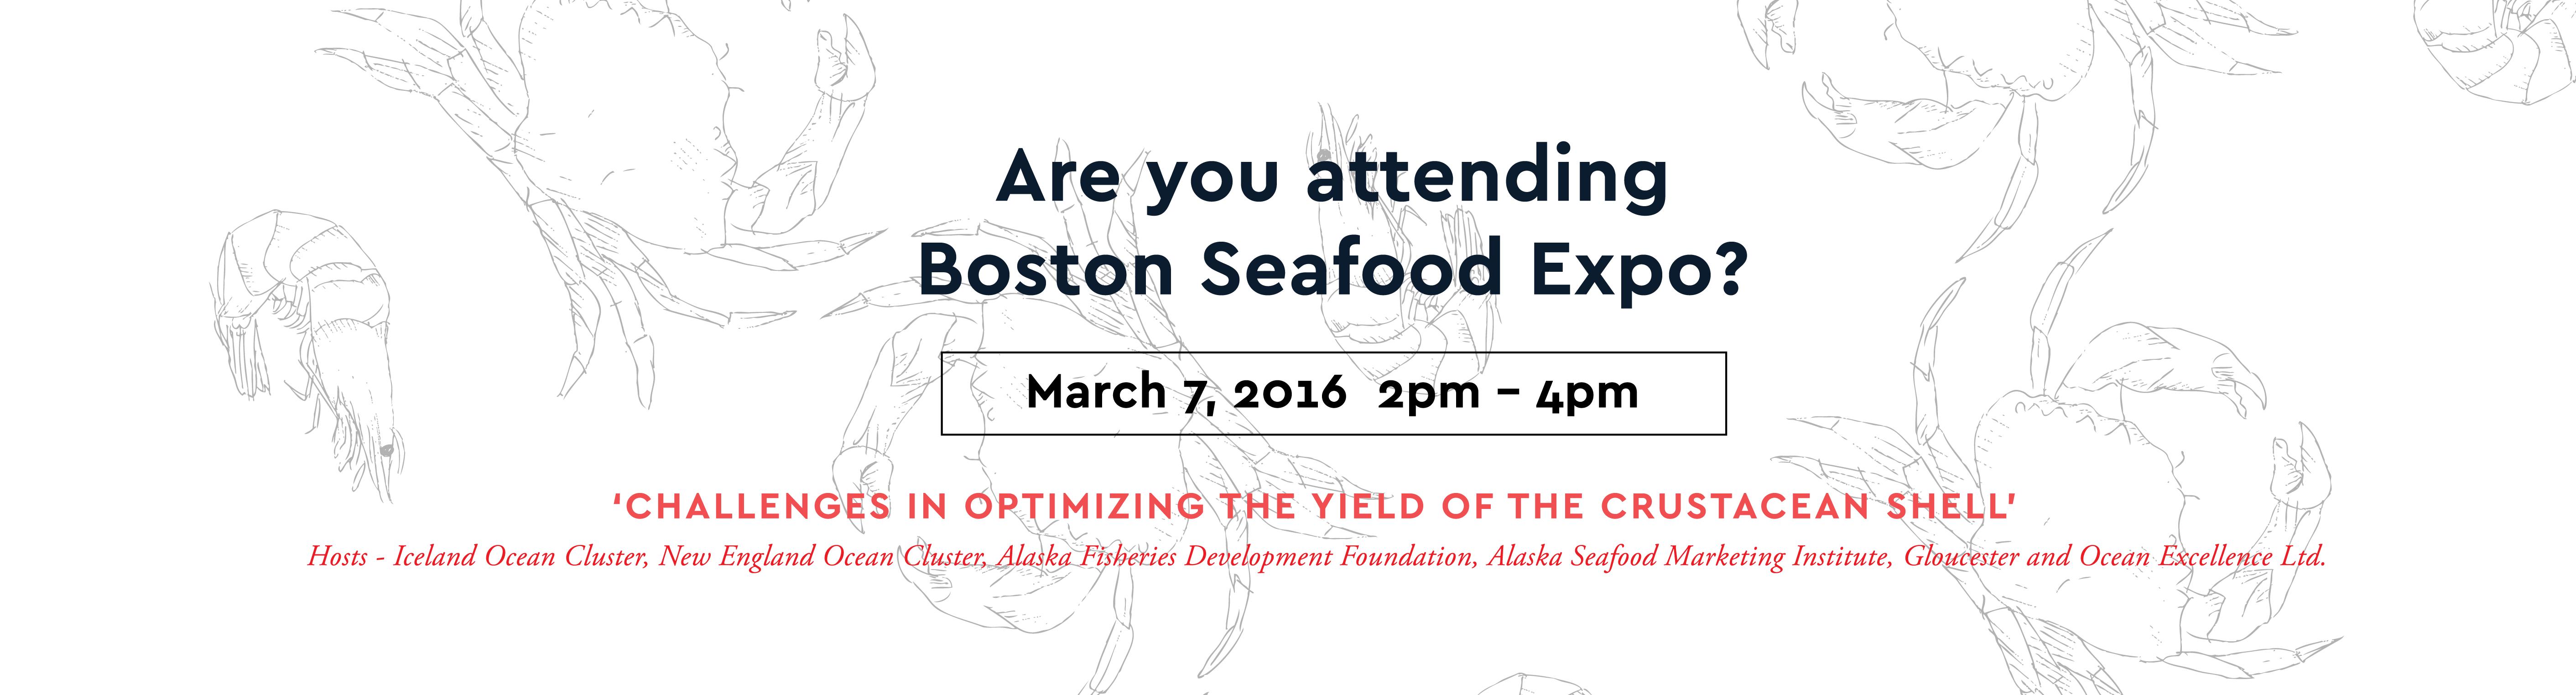 boston-seafood-expo-banner